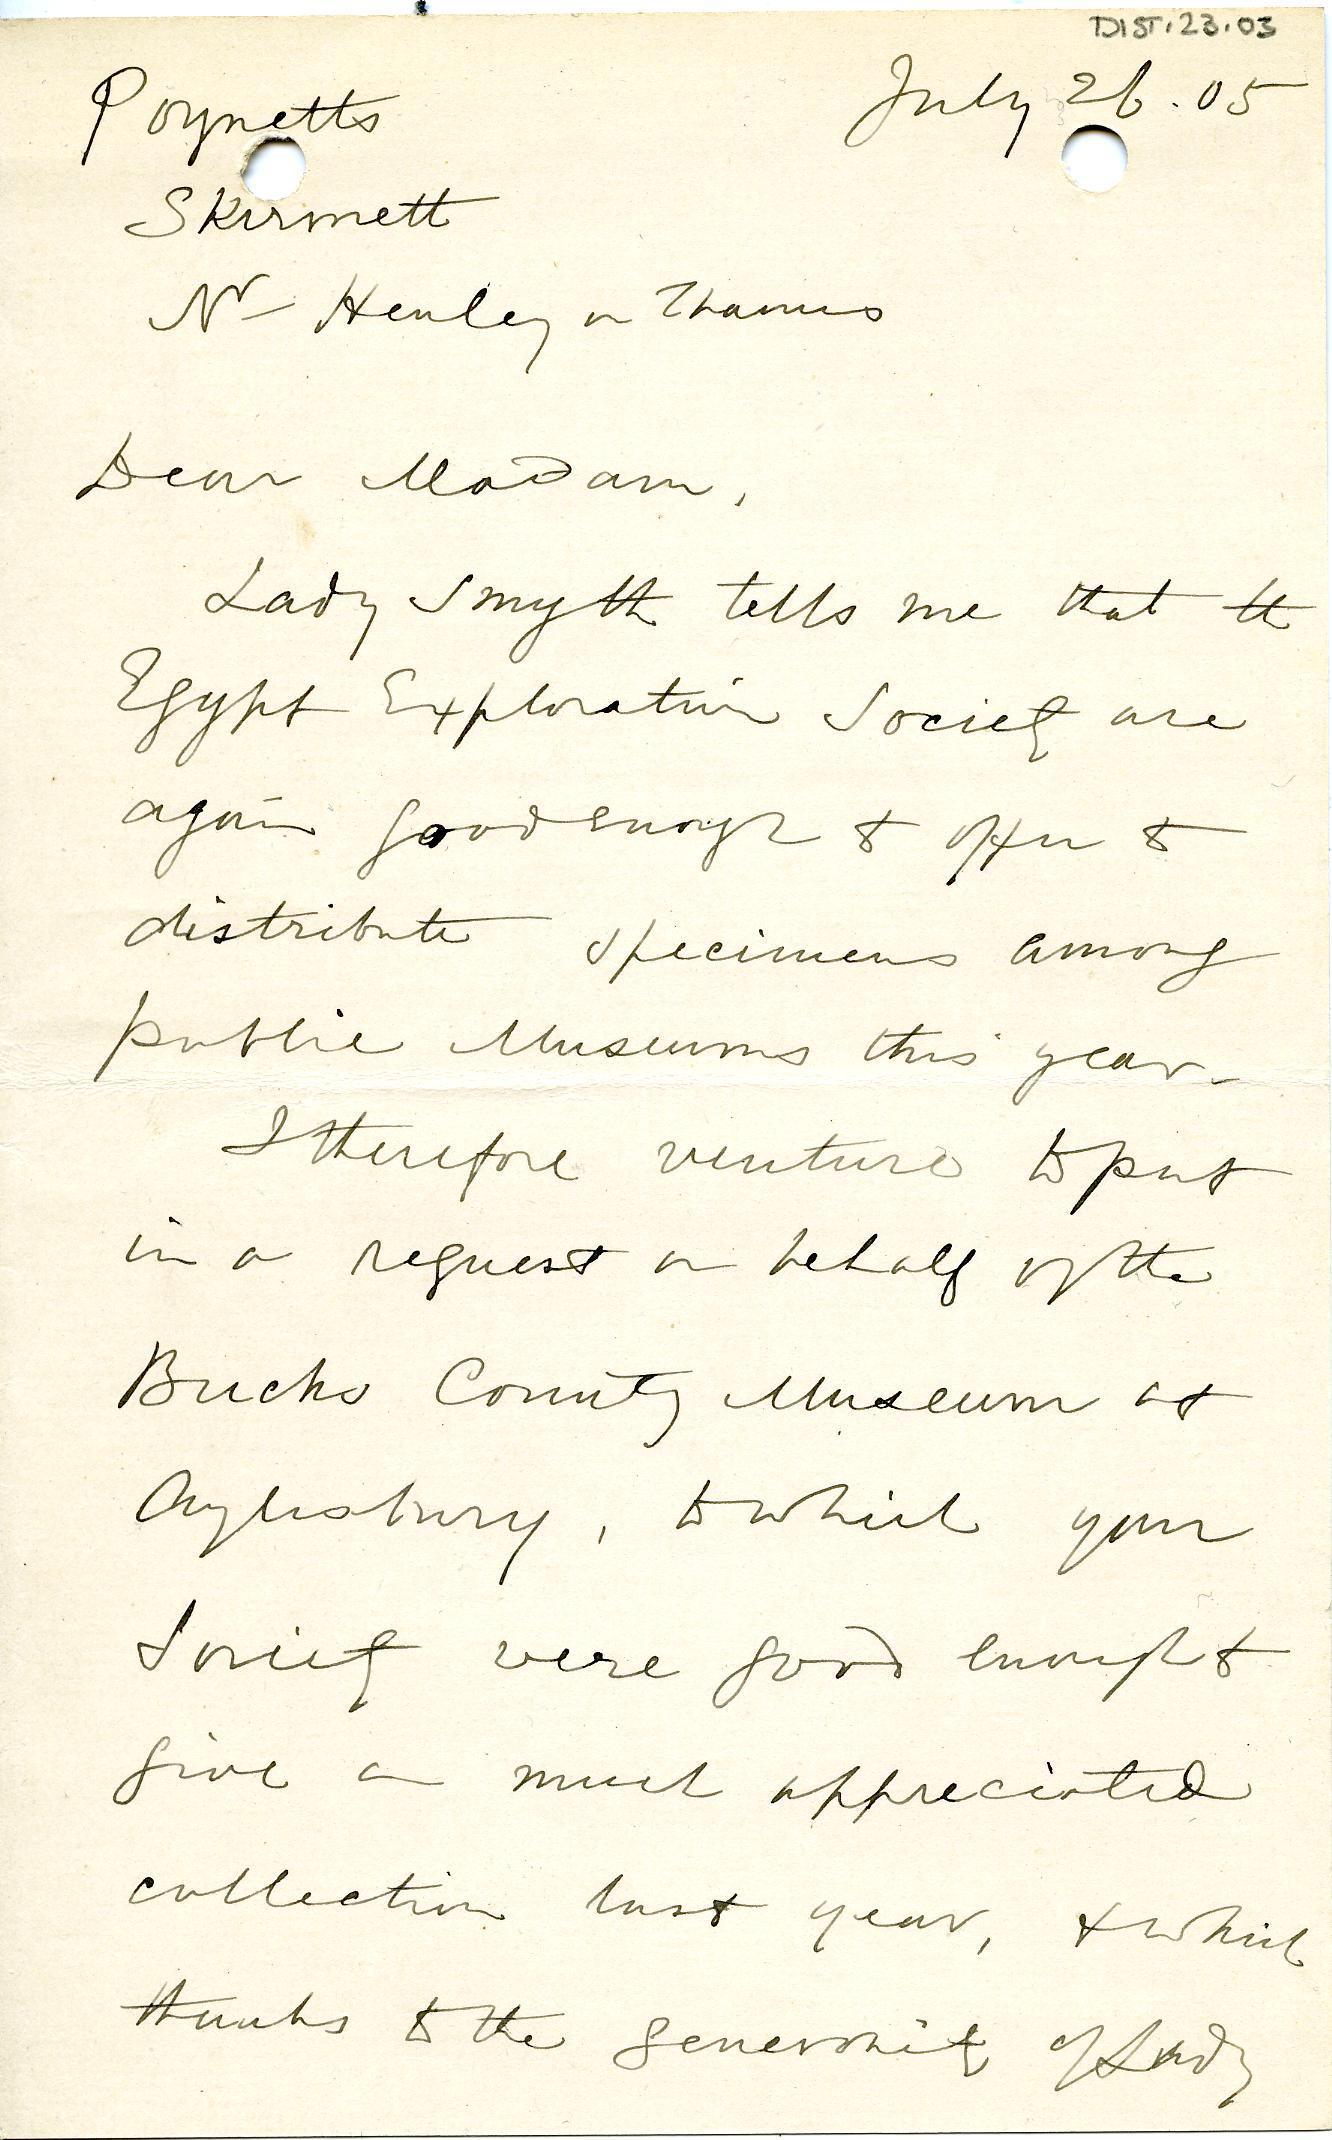 1904-05 Sinai, Deir el-Bahri, Oxyrhynchus, Naukratis DIST.23.03a